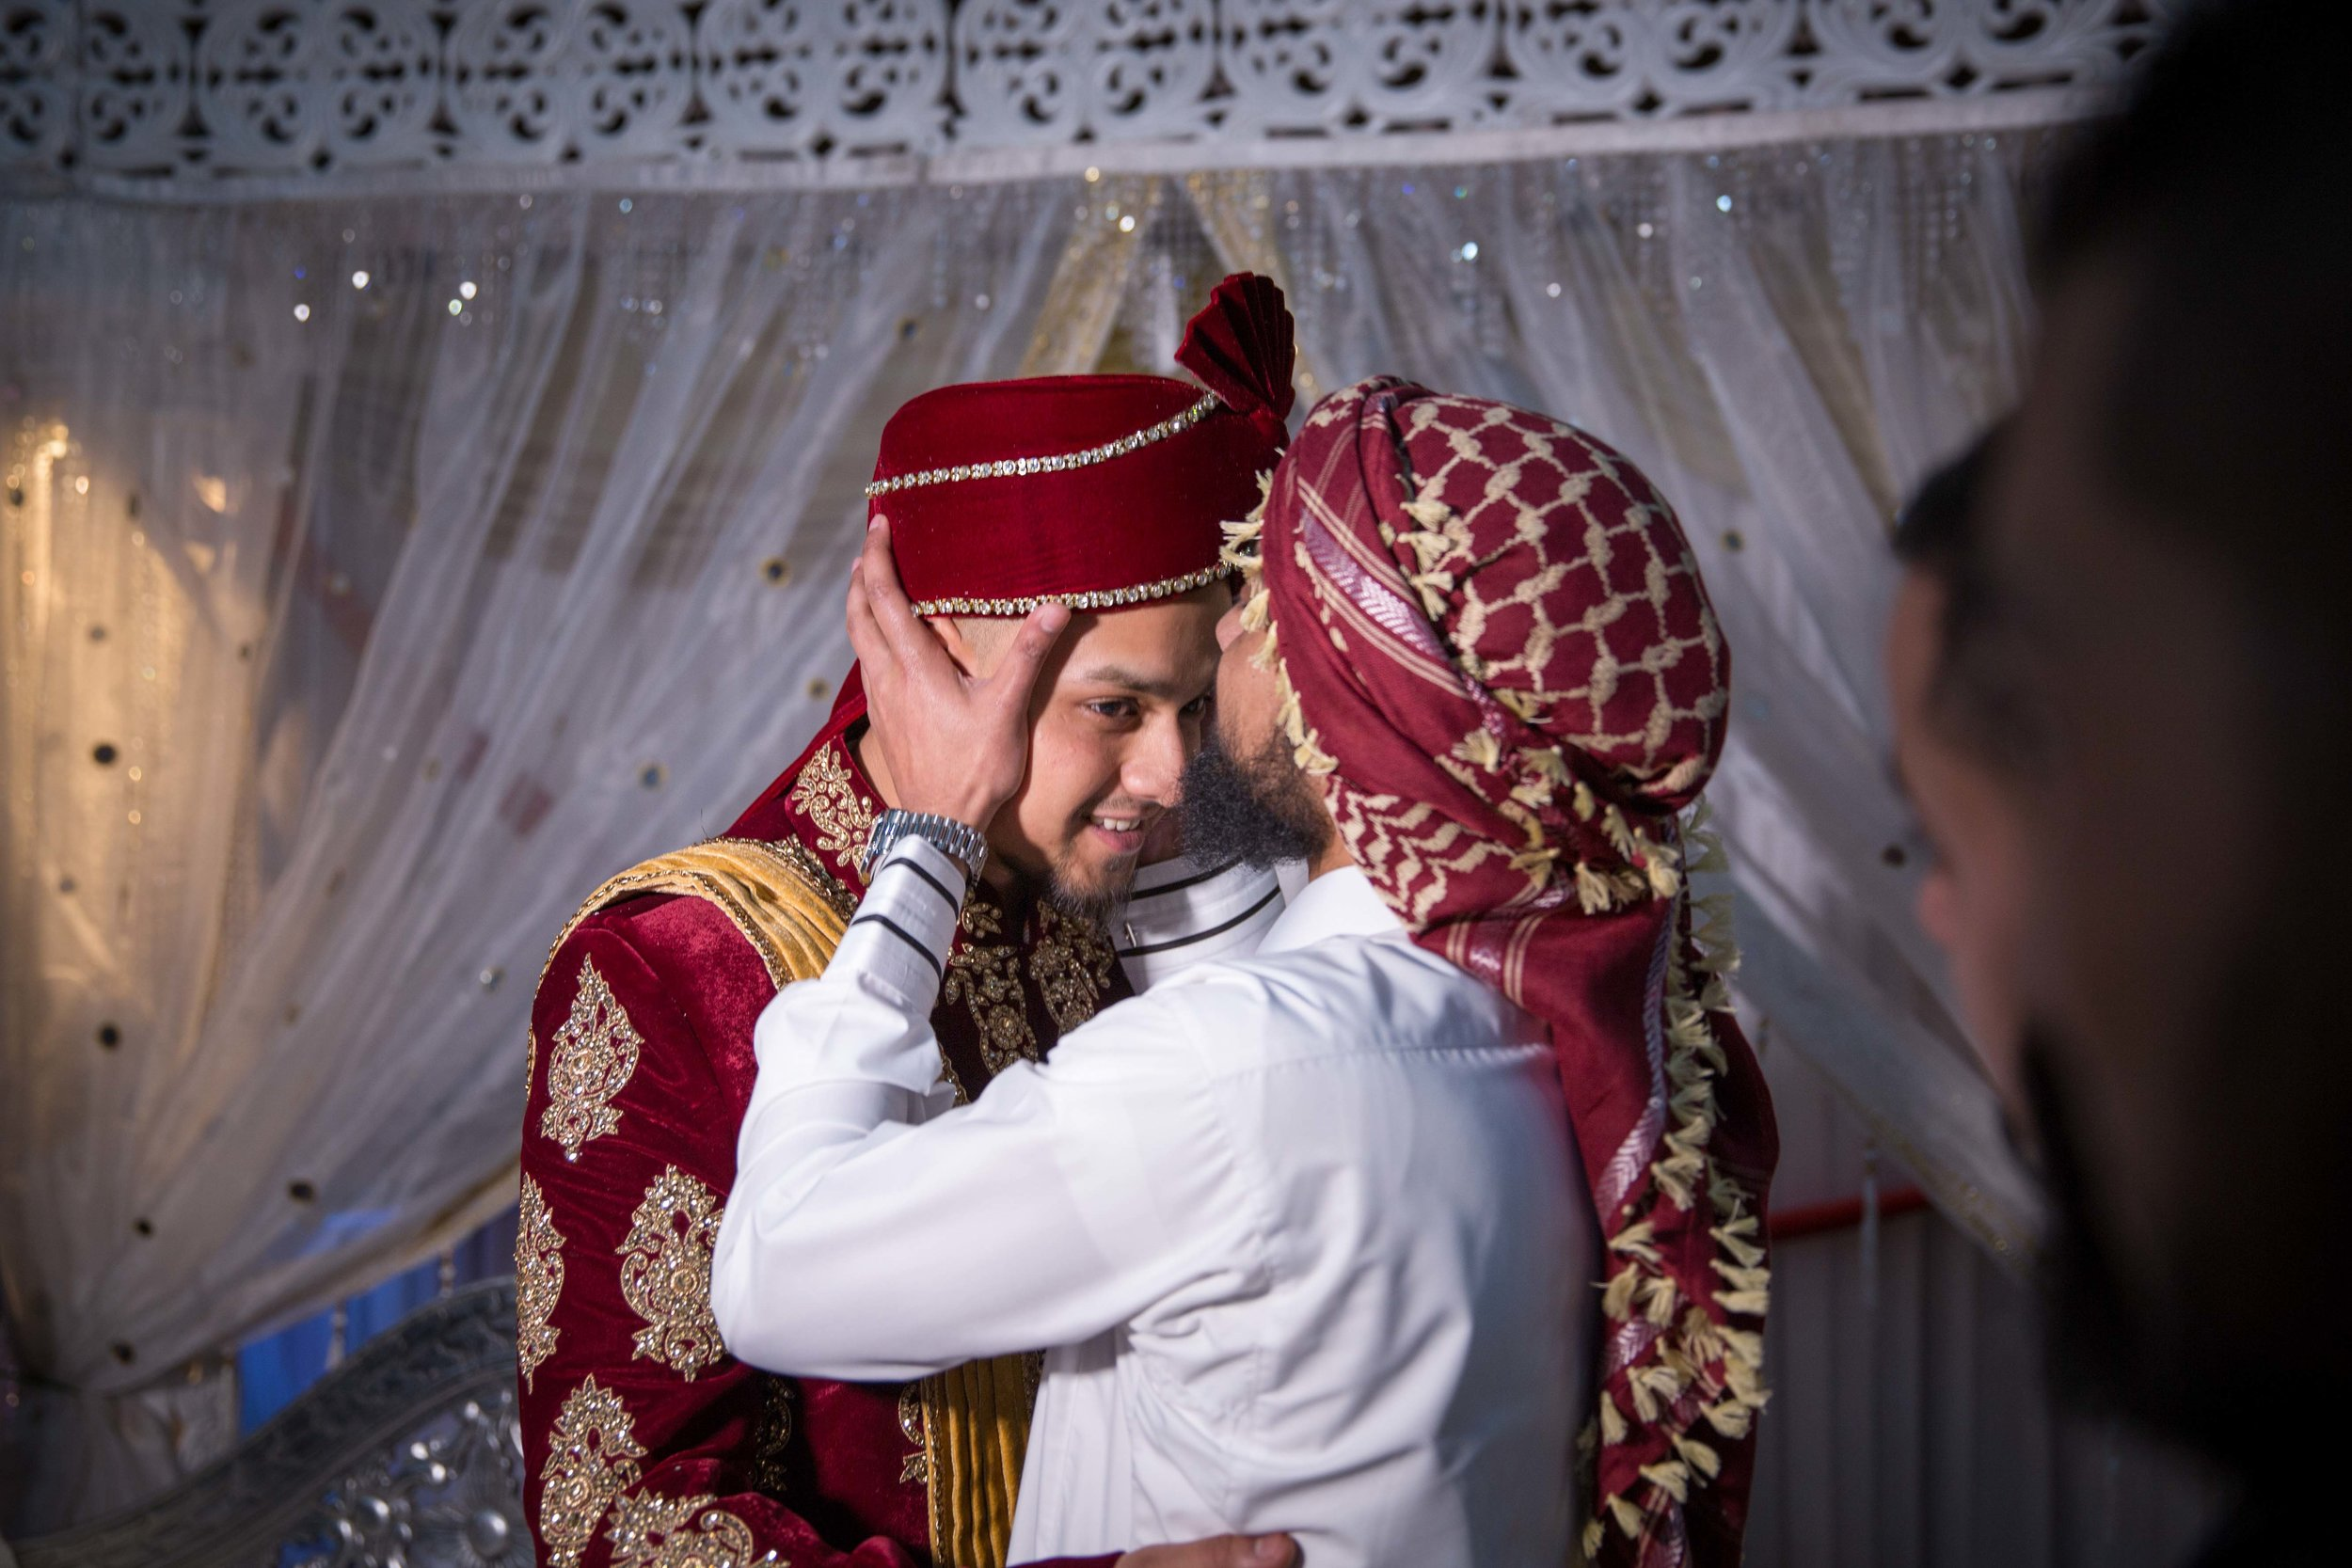 Female-Asian-Piccadilly-banqueting-suite-Wedding-Photographer-Birmingham-natalia-smith-photography-19.jpg